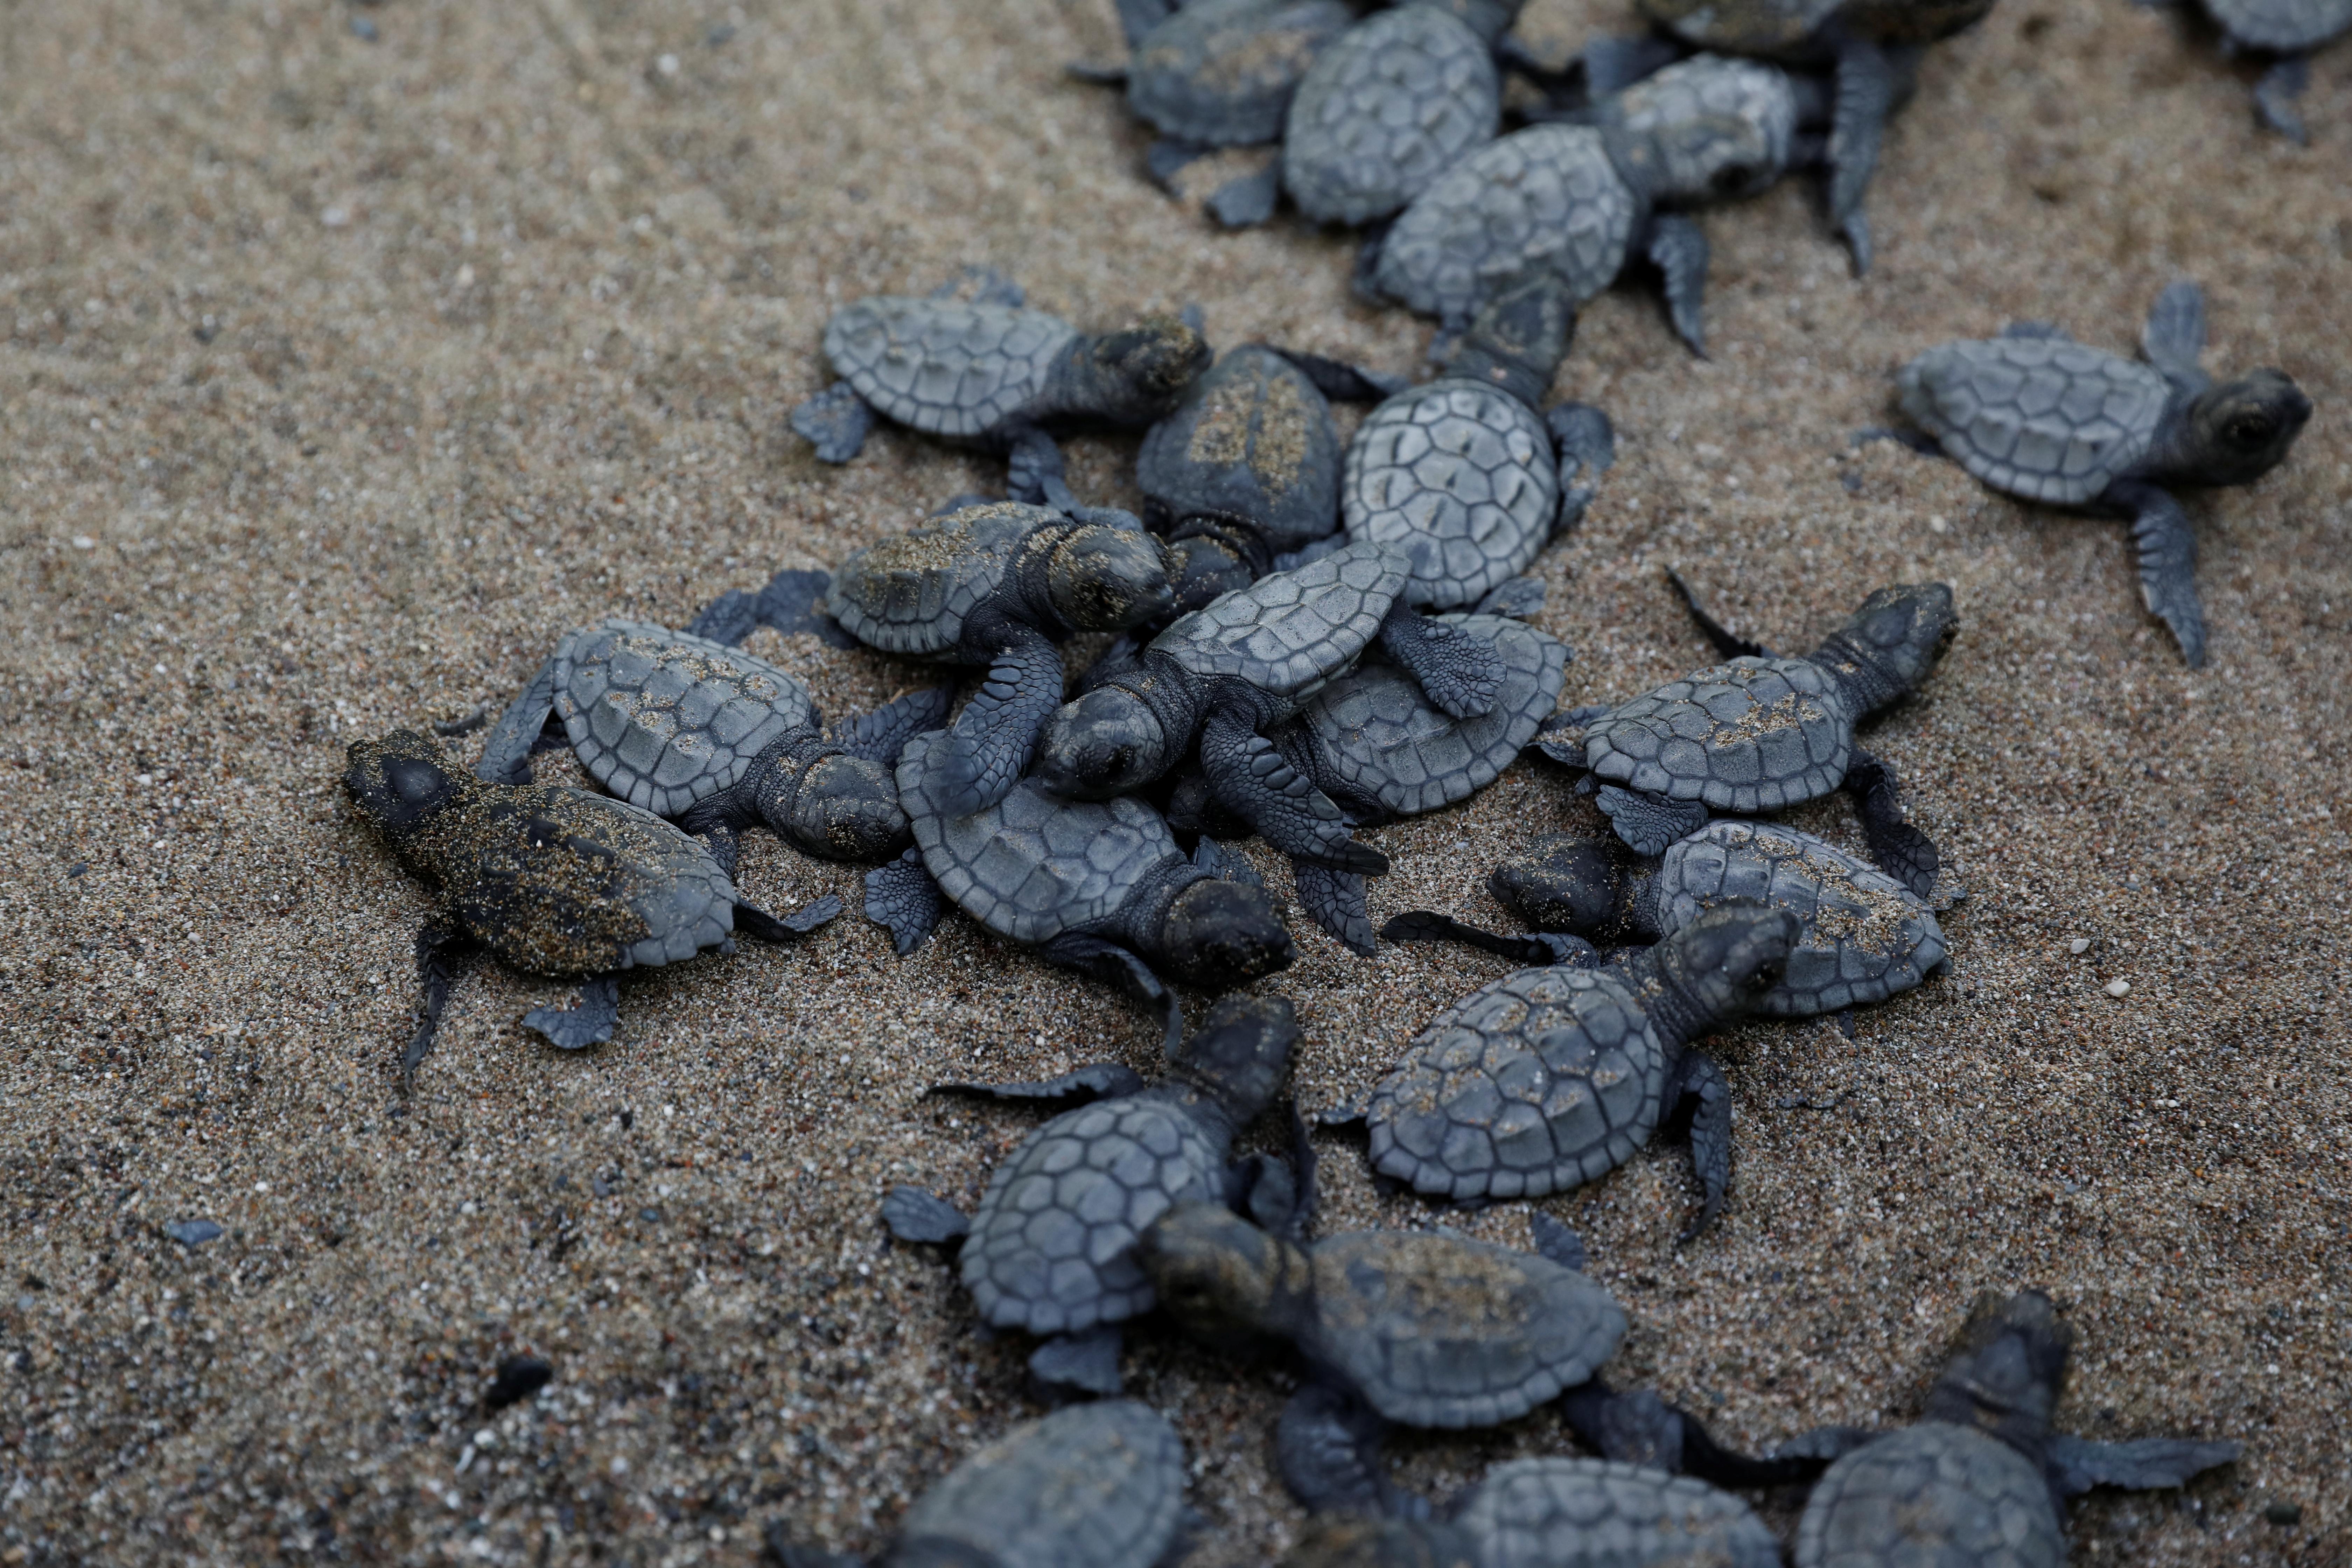 Baby sea turtles.